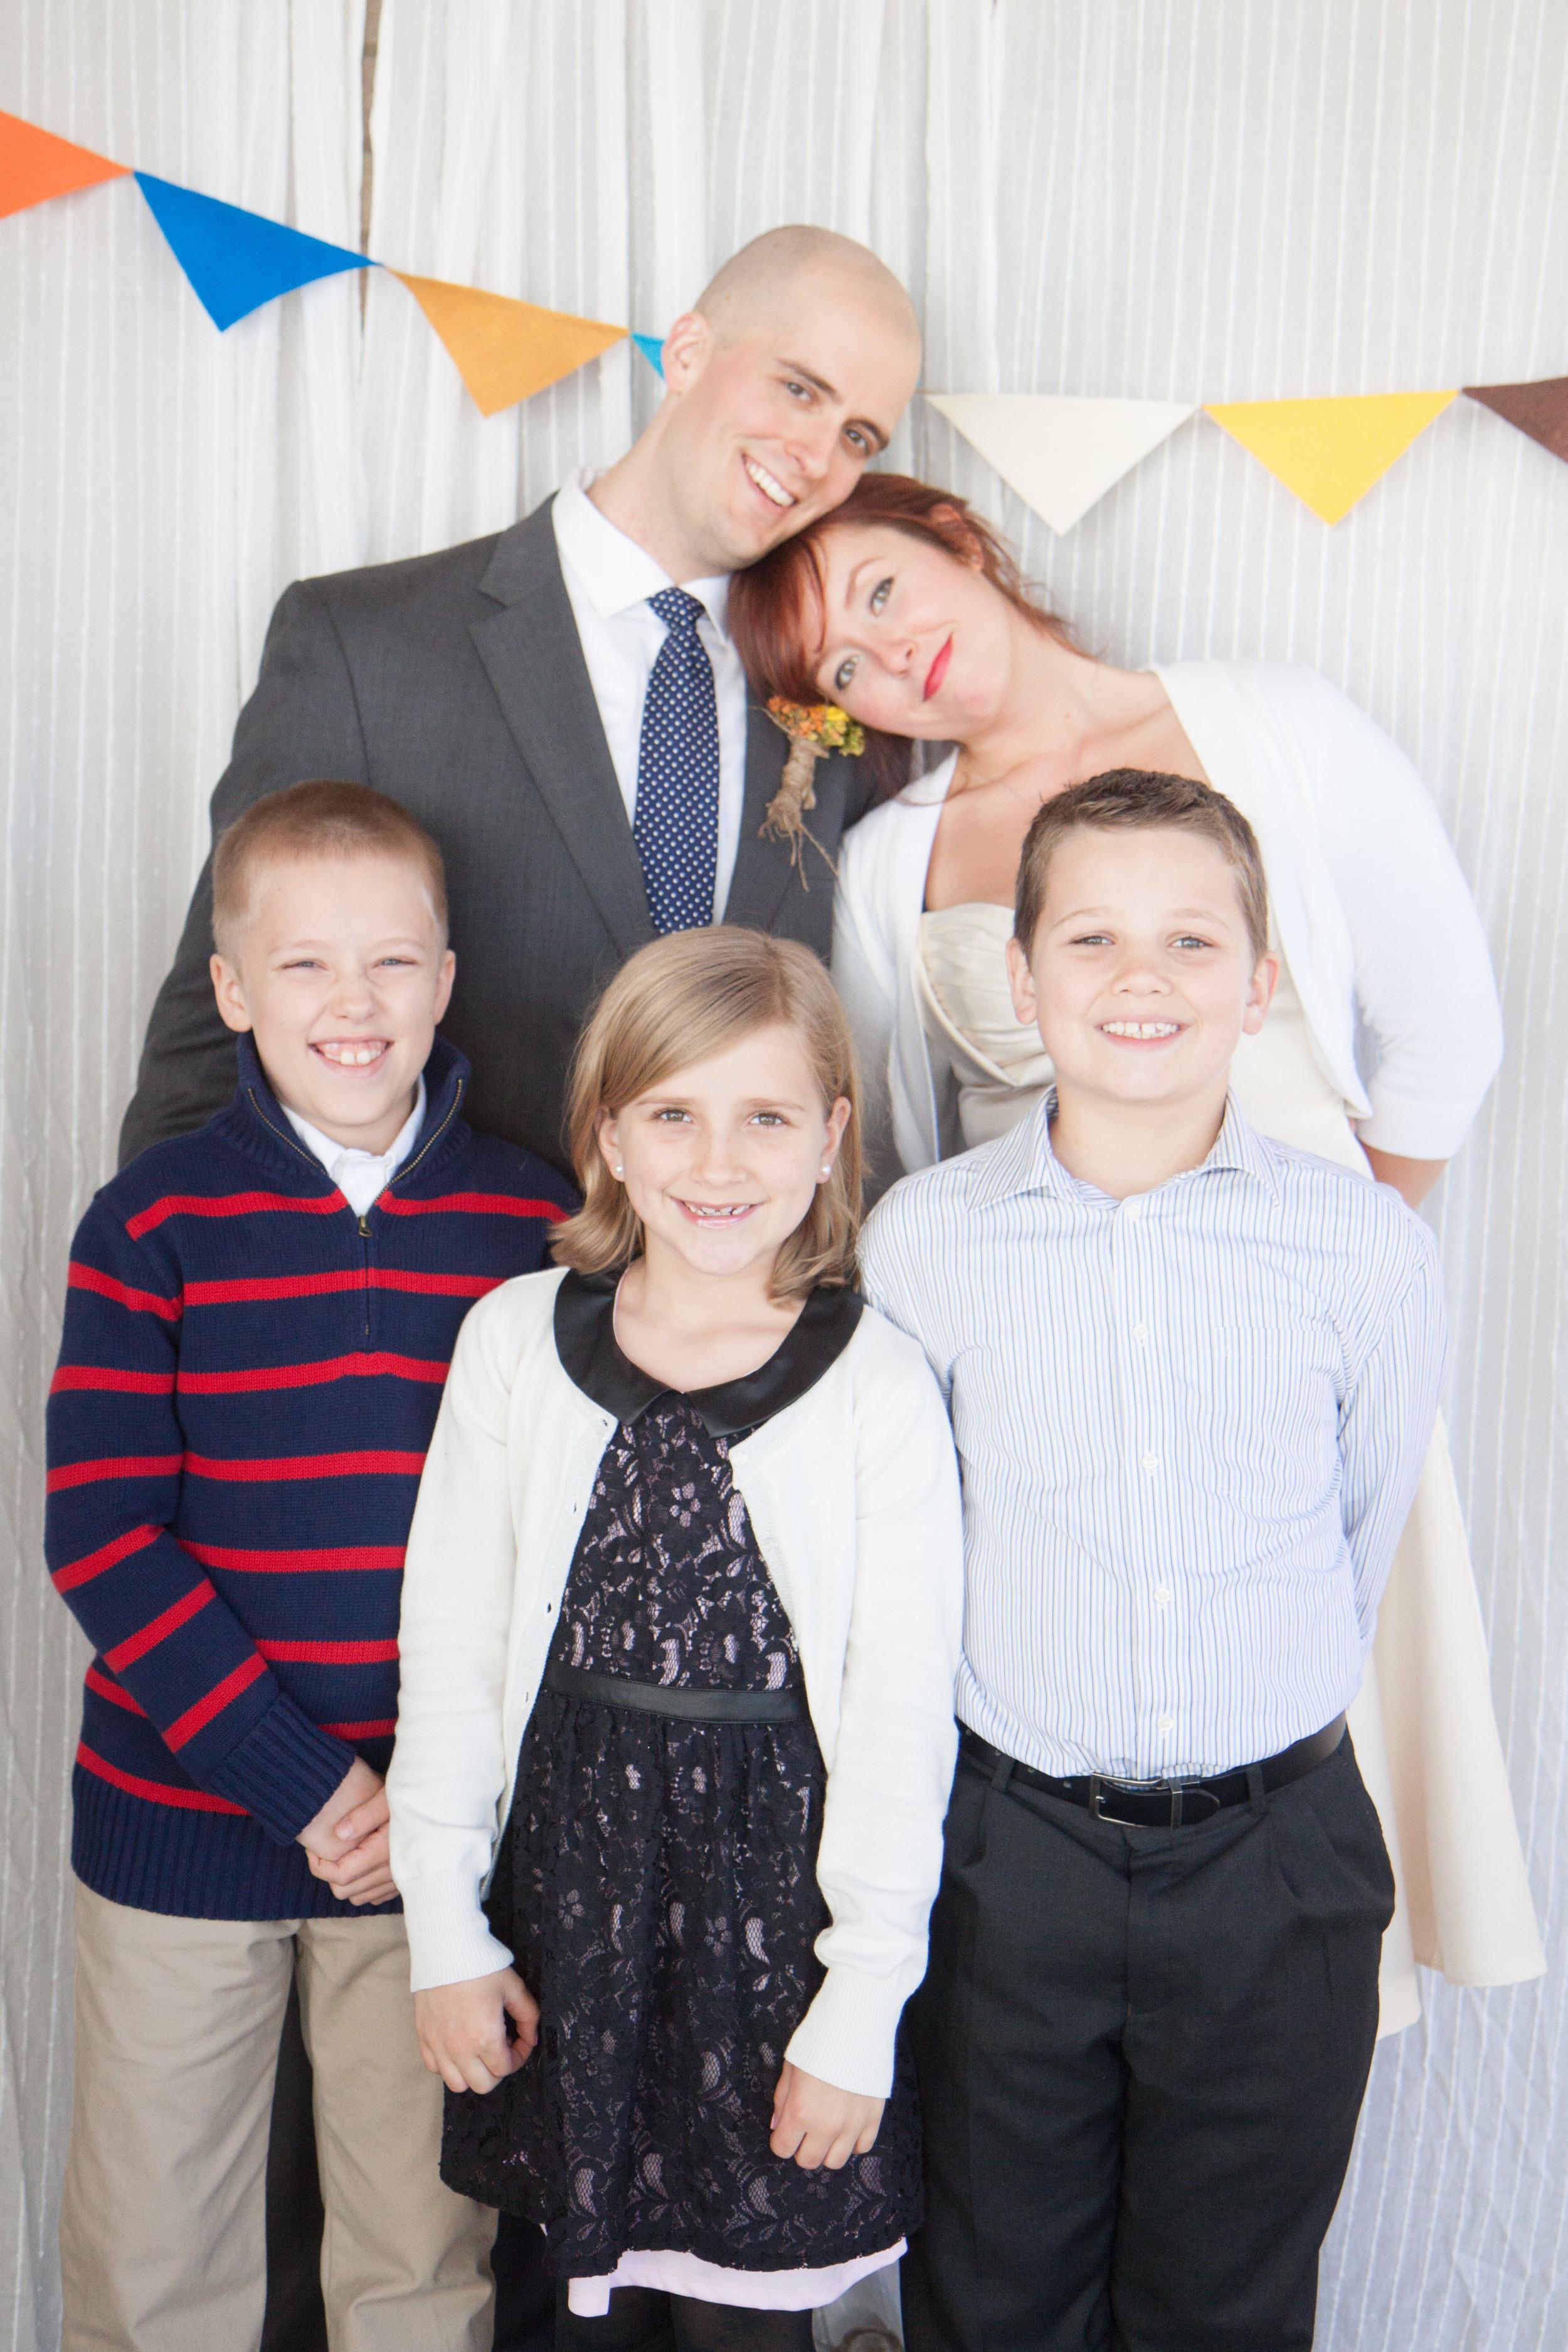 Wilson Bickel Wedding - Family Photos (24 of 25).jpg